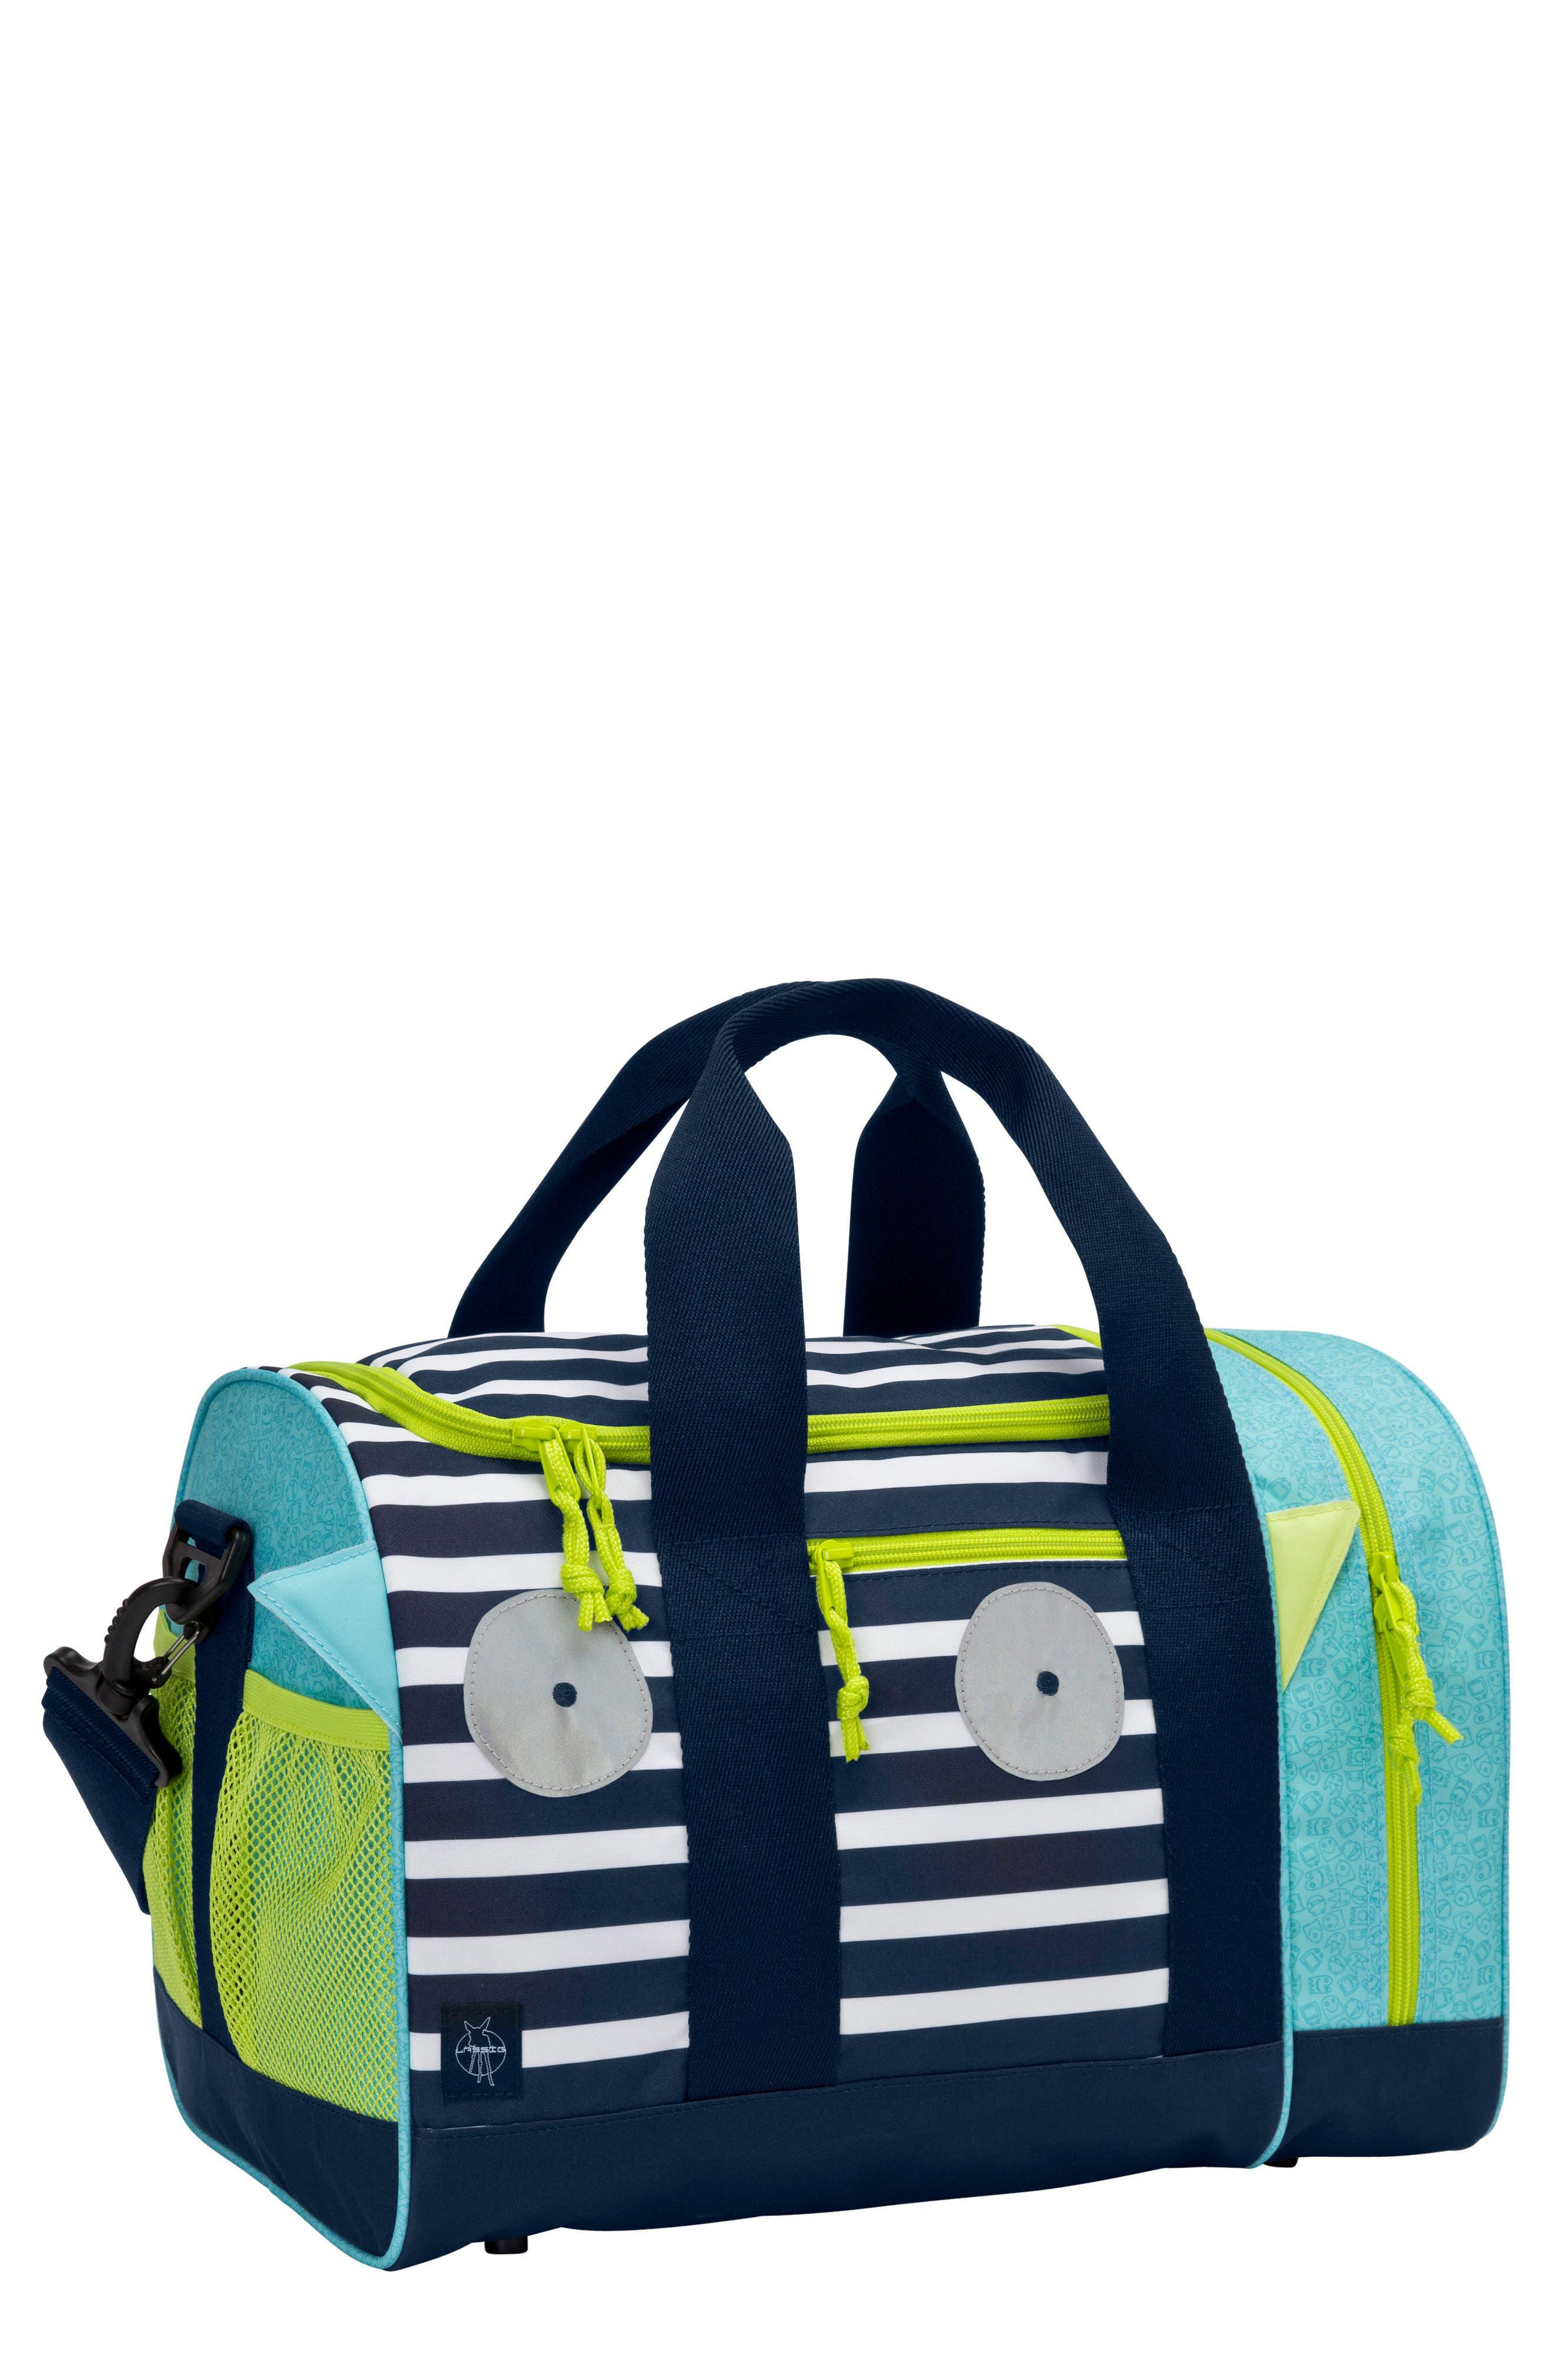 Mini Sports Bag with Glow-in-the-Dark Eyes,                             Main thumbnail 1, color,                             BOUNCING BOB